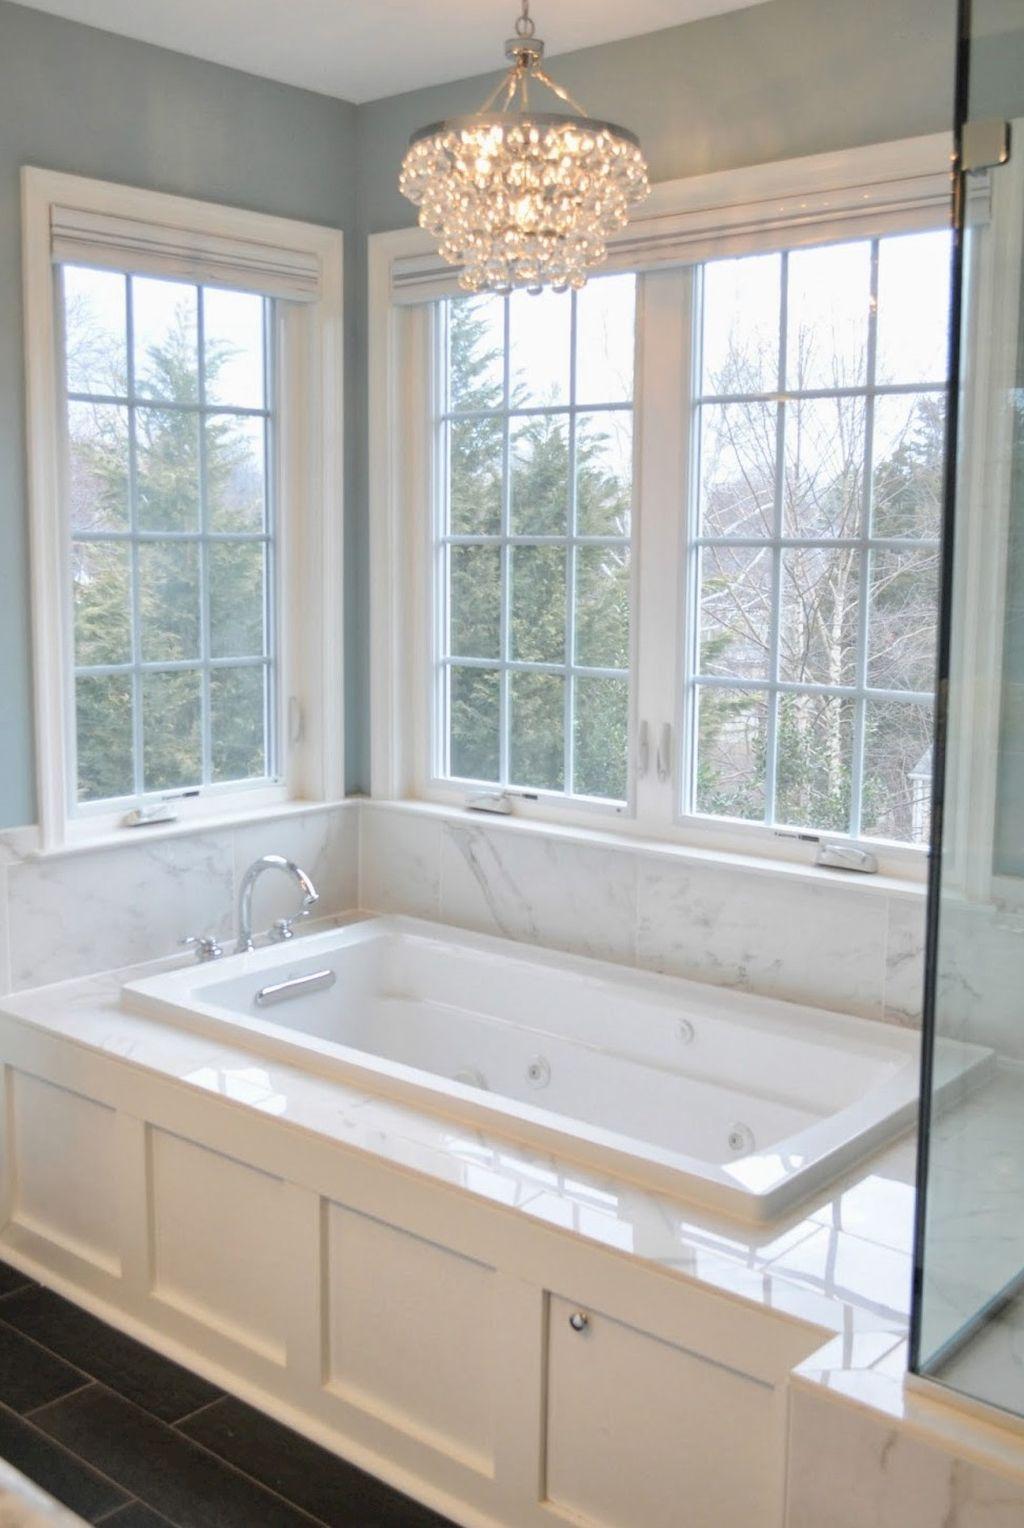 Small window ideas bathrooms   small bathroom remodel with bathtub ideas  bathtub ideas small